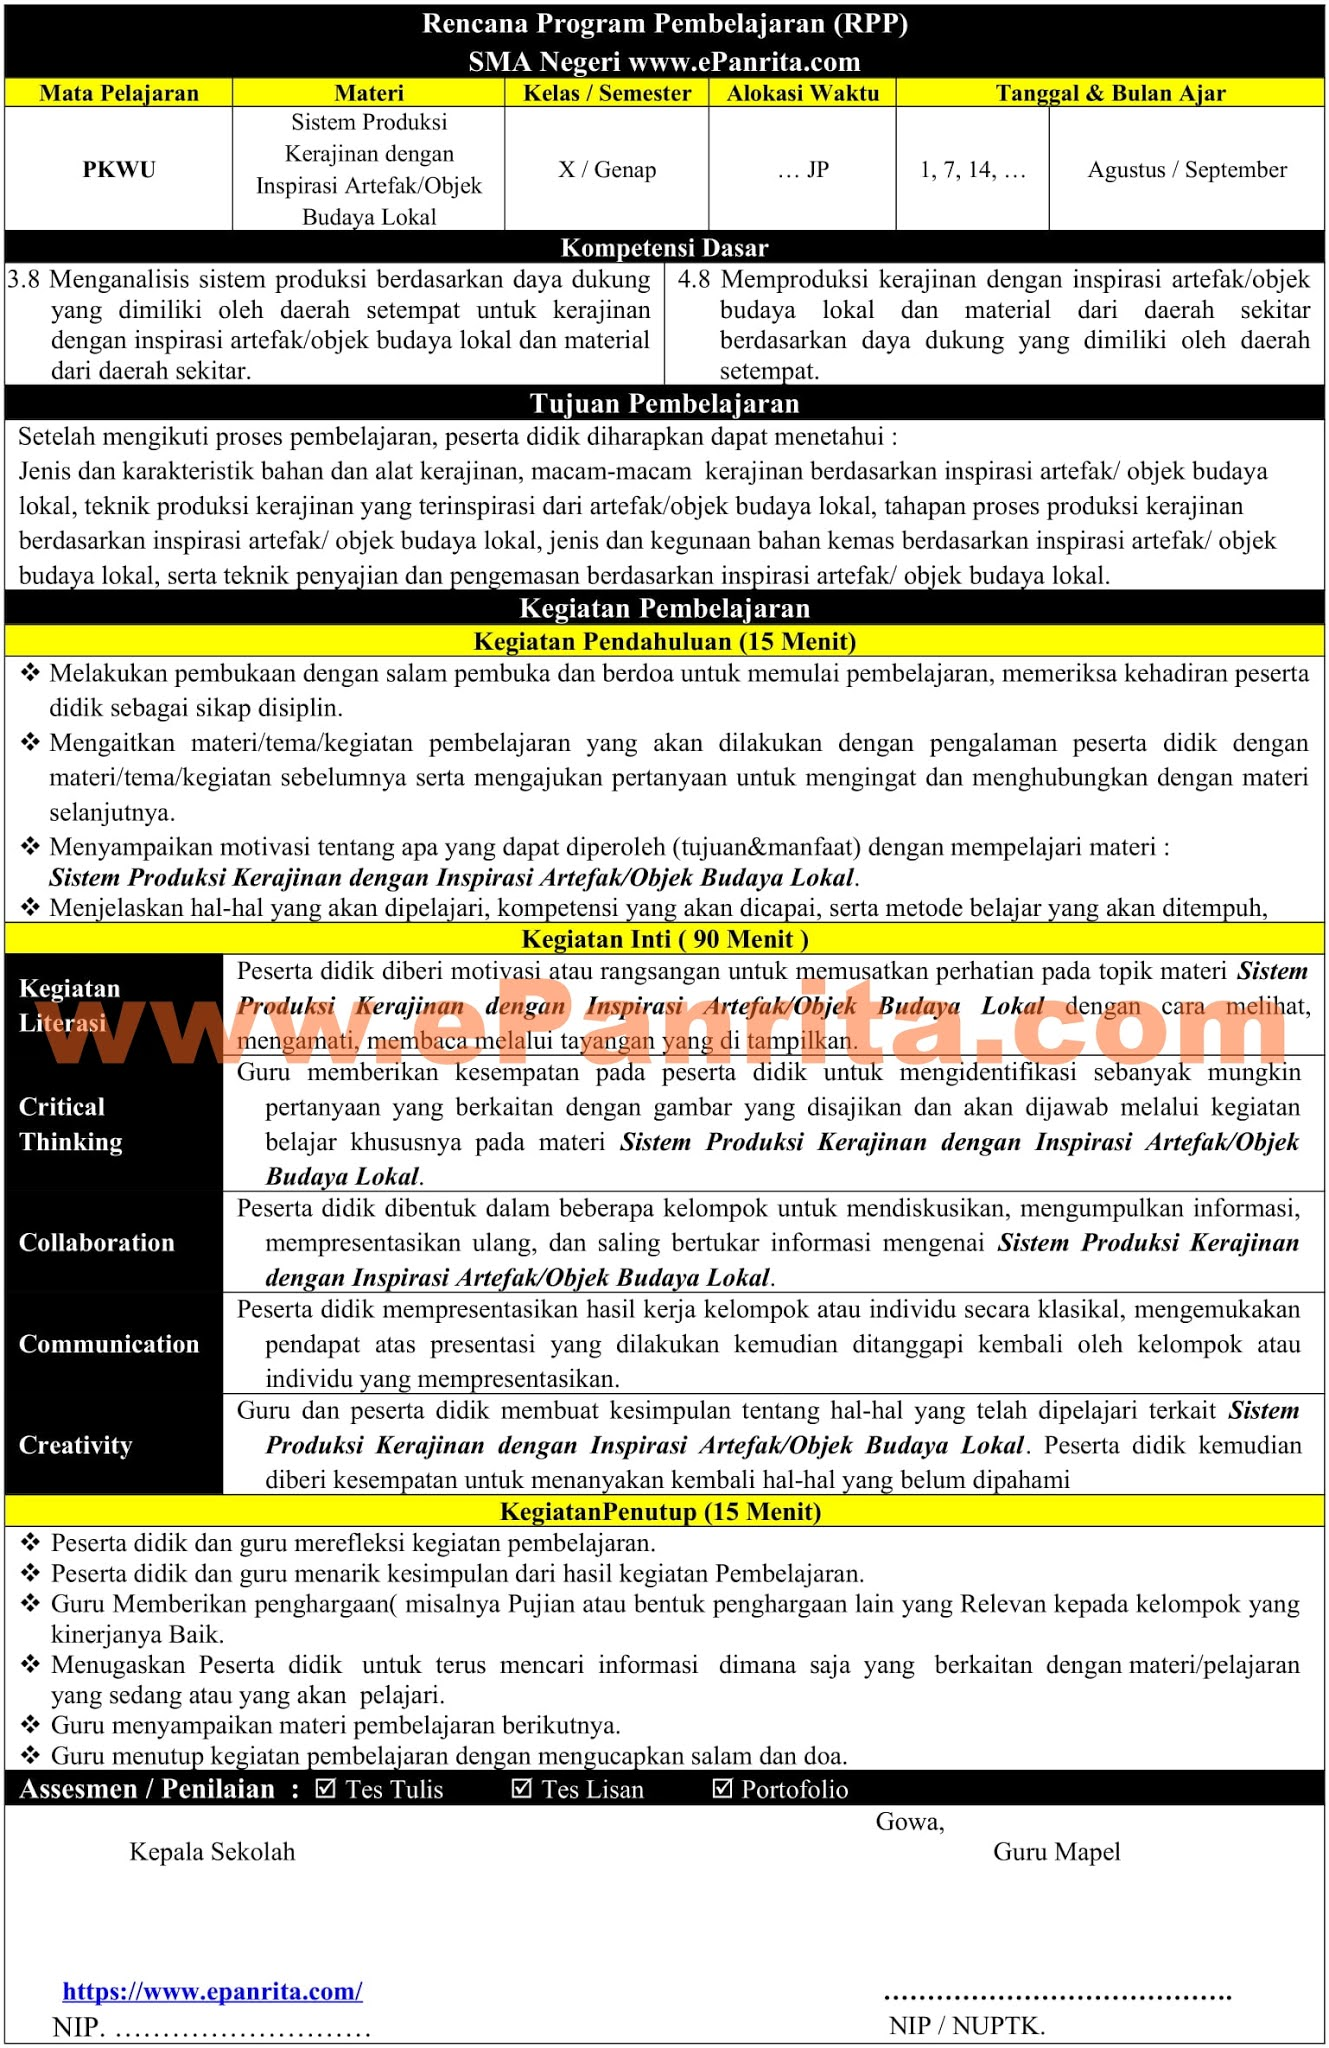 RPP 1 Halaman Prakarya Aspek Kerajinan (Sistem Produksi Kerajinan dengan Inspirasi Artefak/Objek Budaya Lokal)